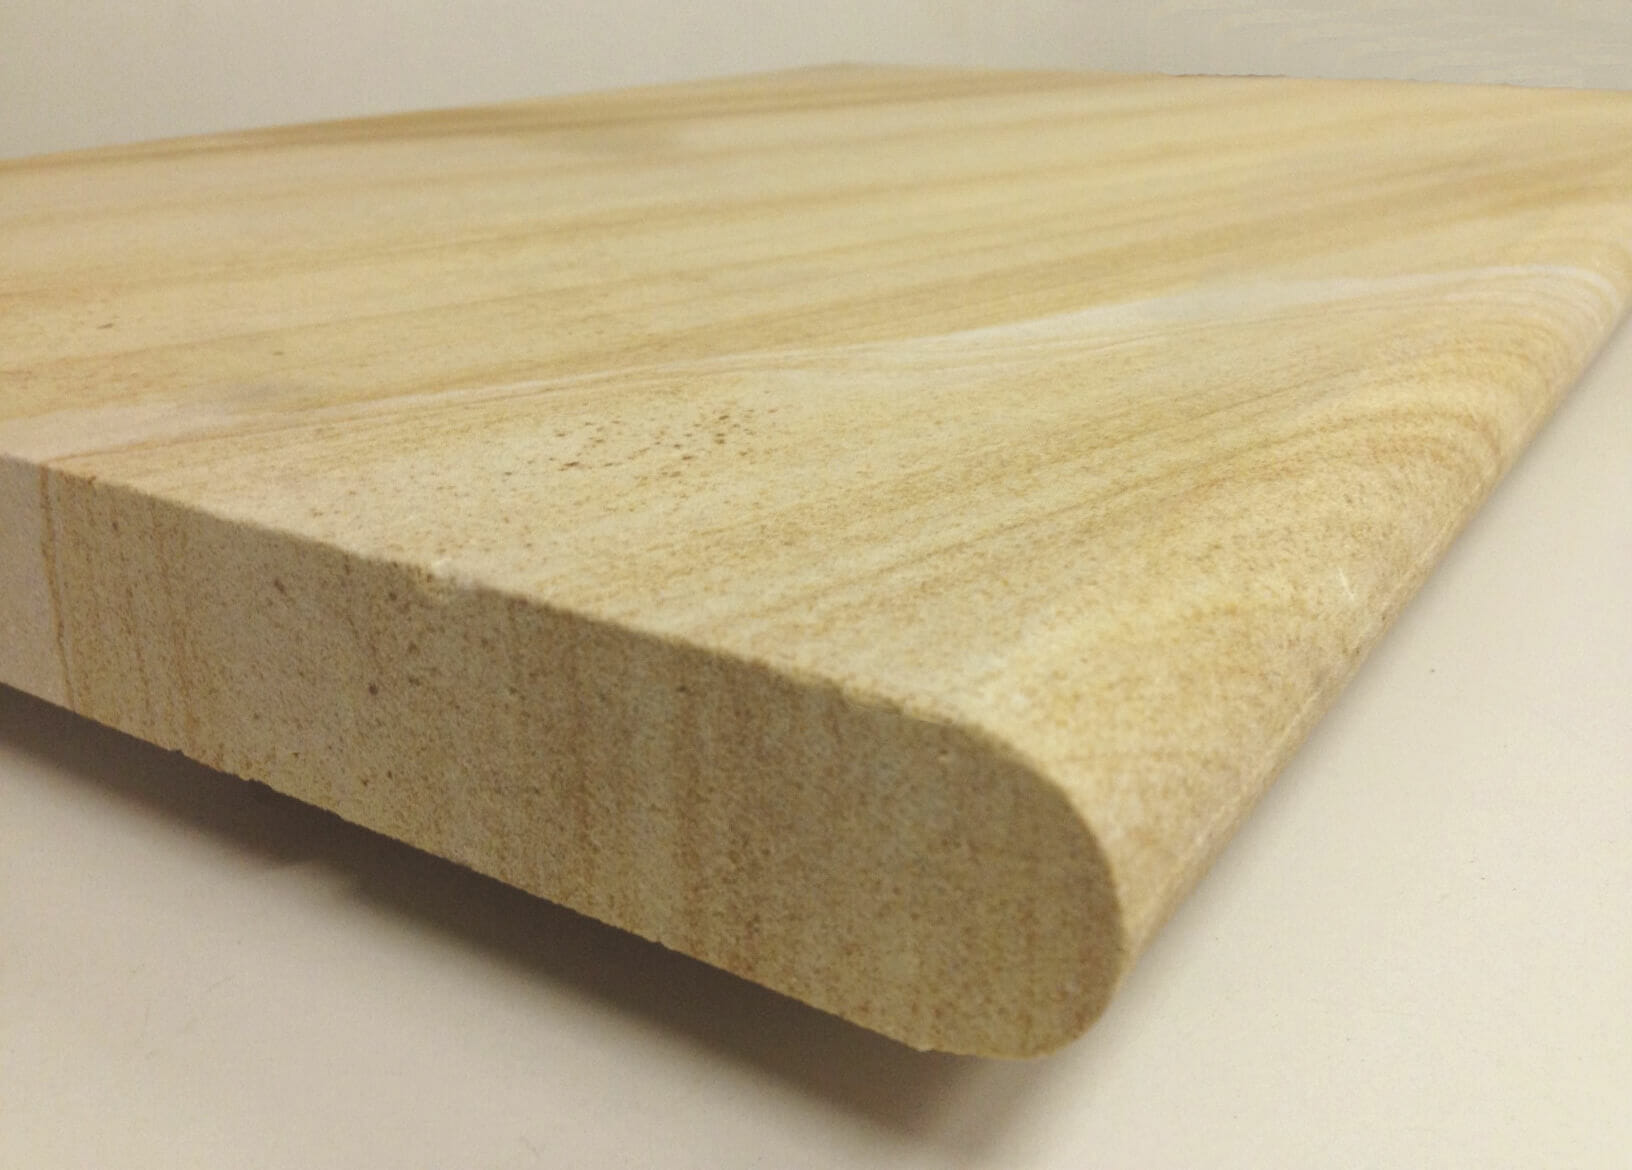 SYDNEY POOL COPING TILES- Sandstone, Travertine, Granite, Bluestone